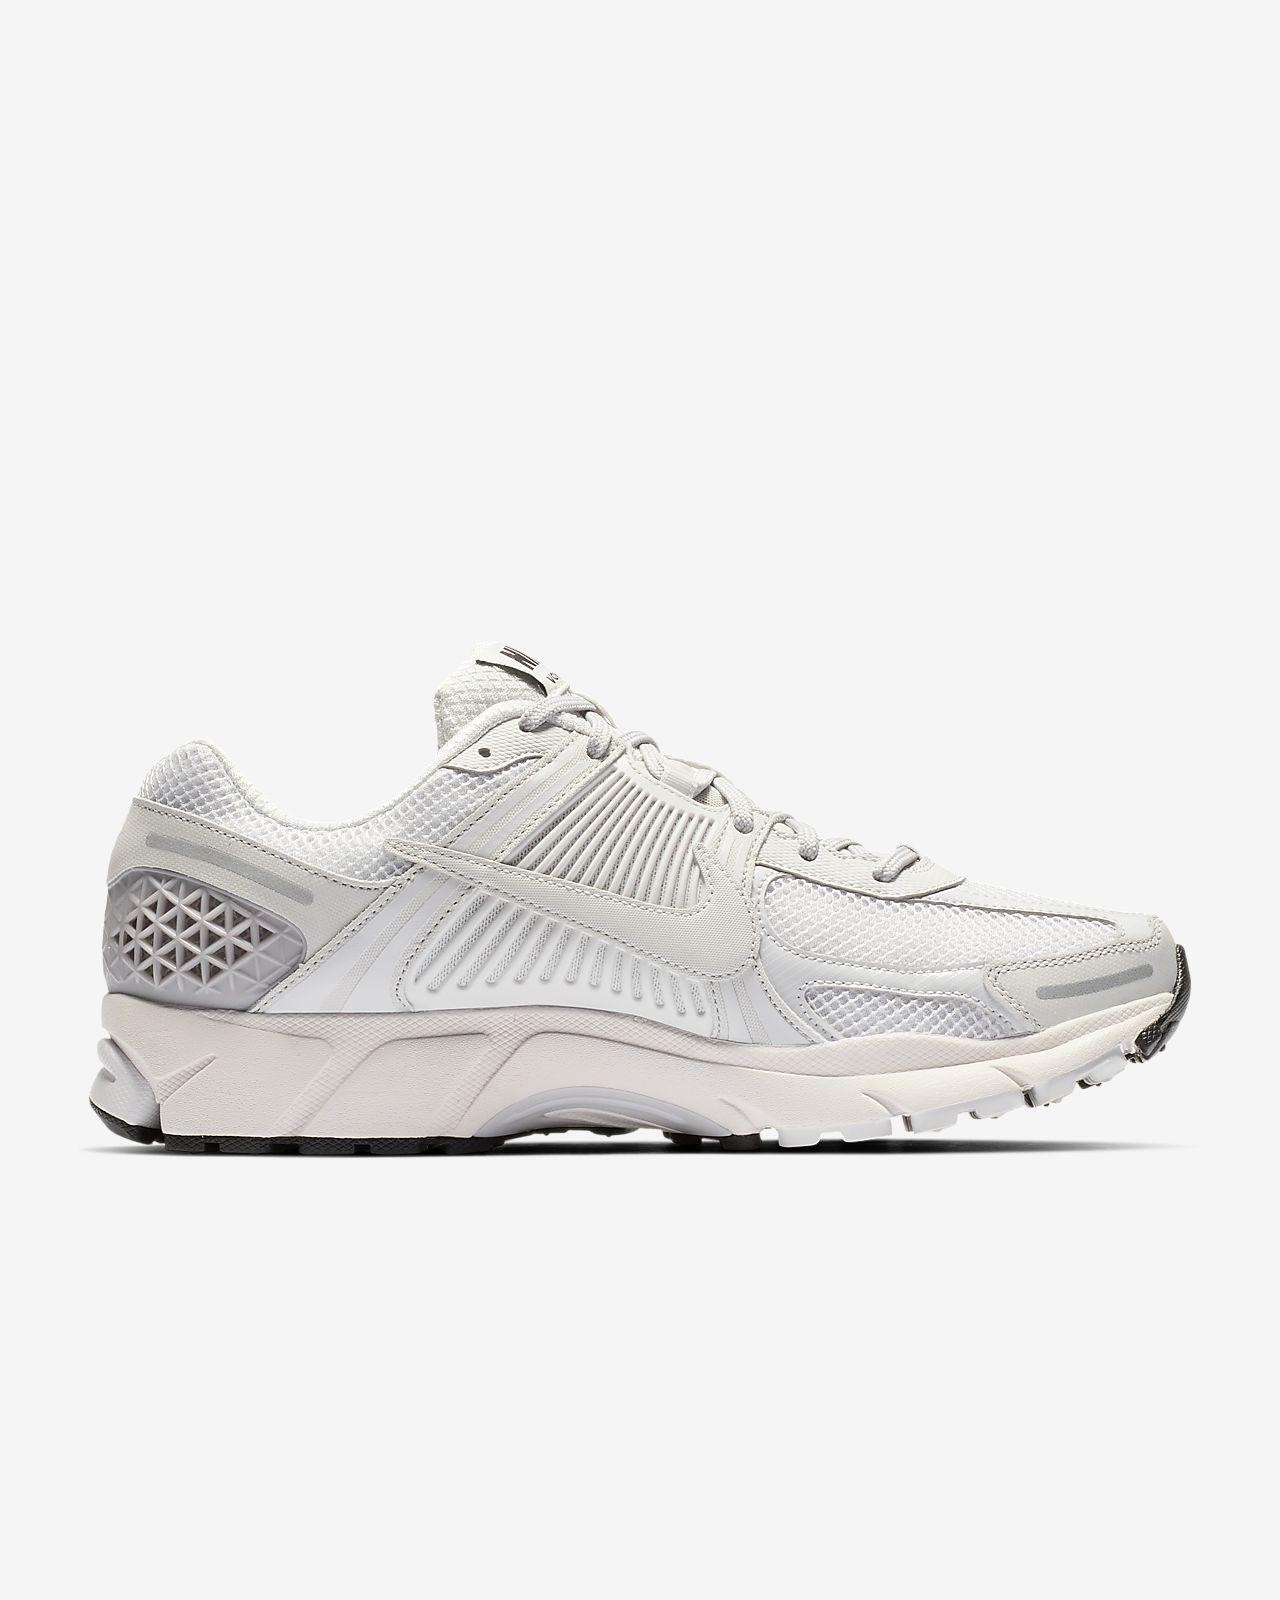 official photos 88f27 3b488 ... Nike Zoom Vomero 5 SP Men s Shoe